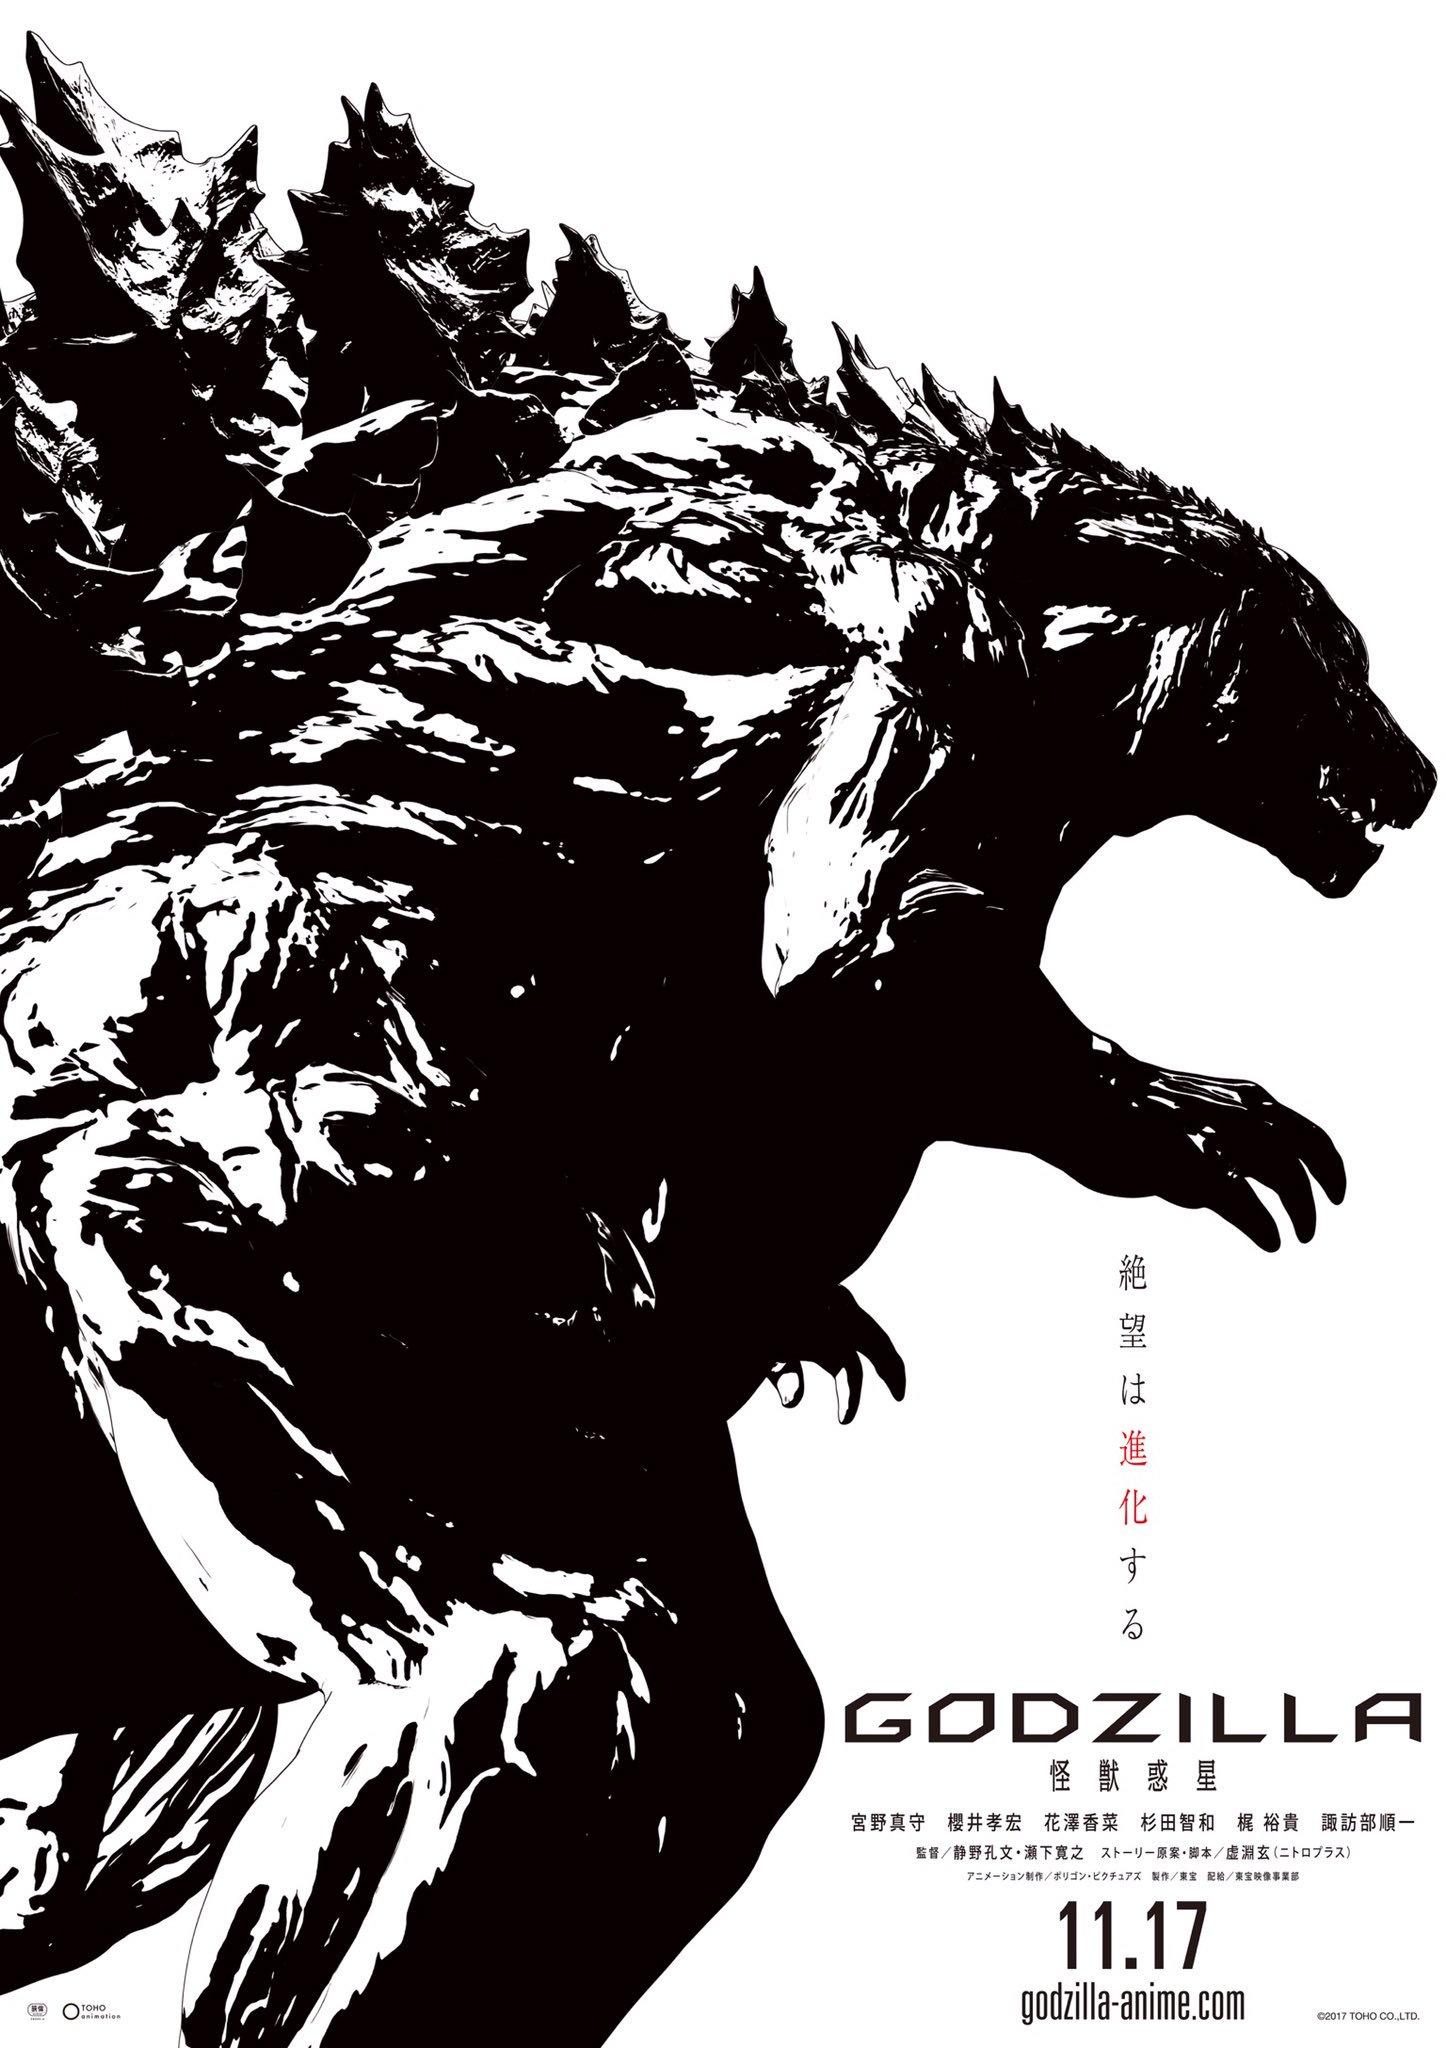 Godzilla: Planet of the MonstersFan Feed